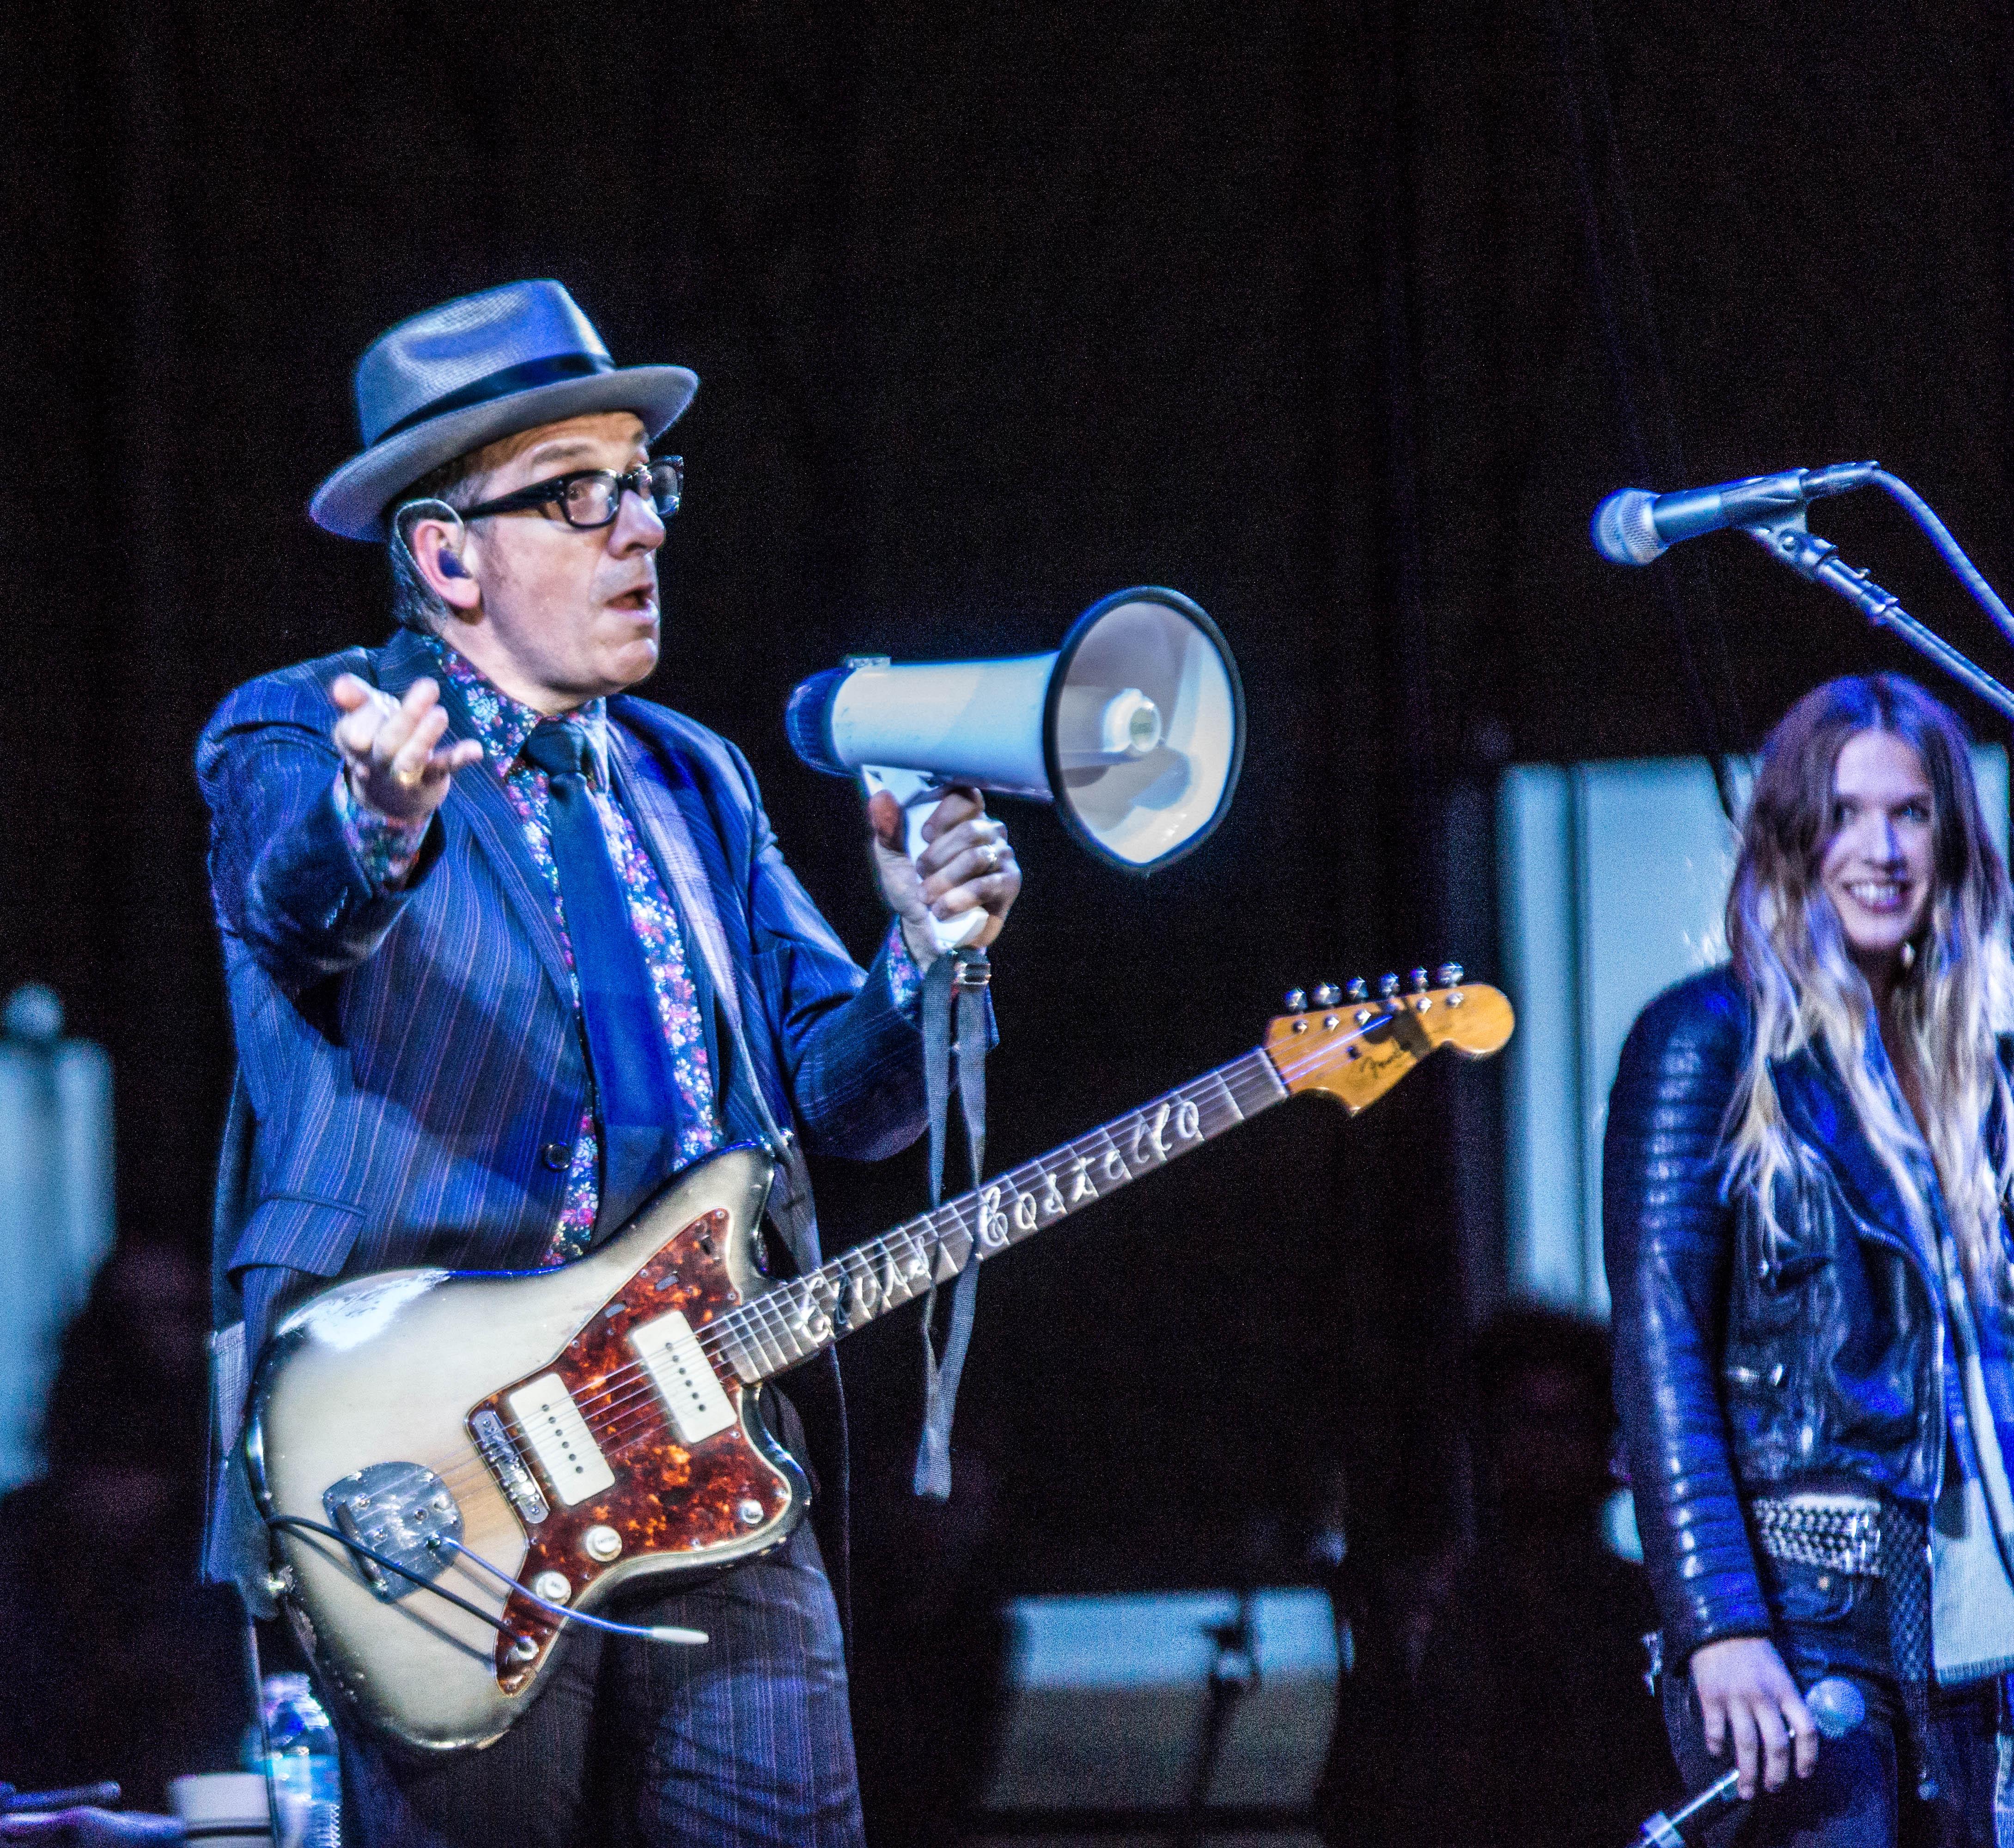 Elvis Costello @ Sasquatch! 2013 (Photo by Greg Roth)